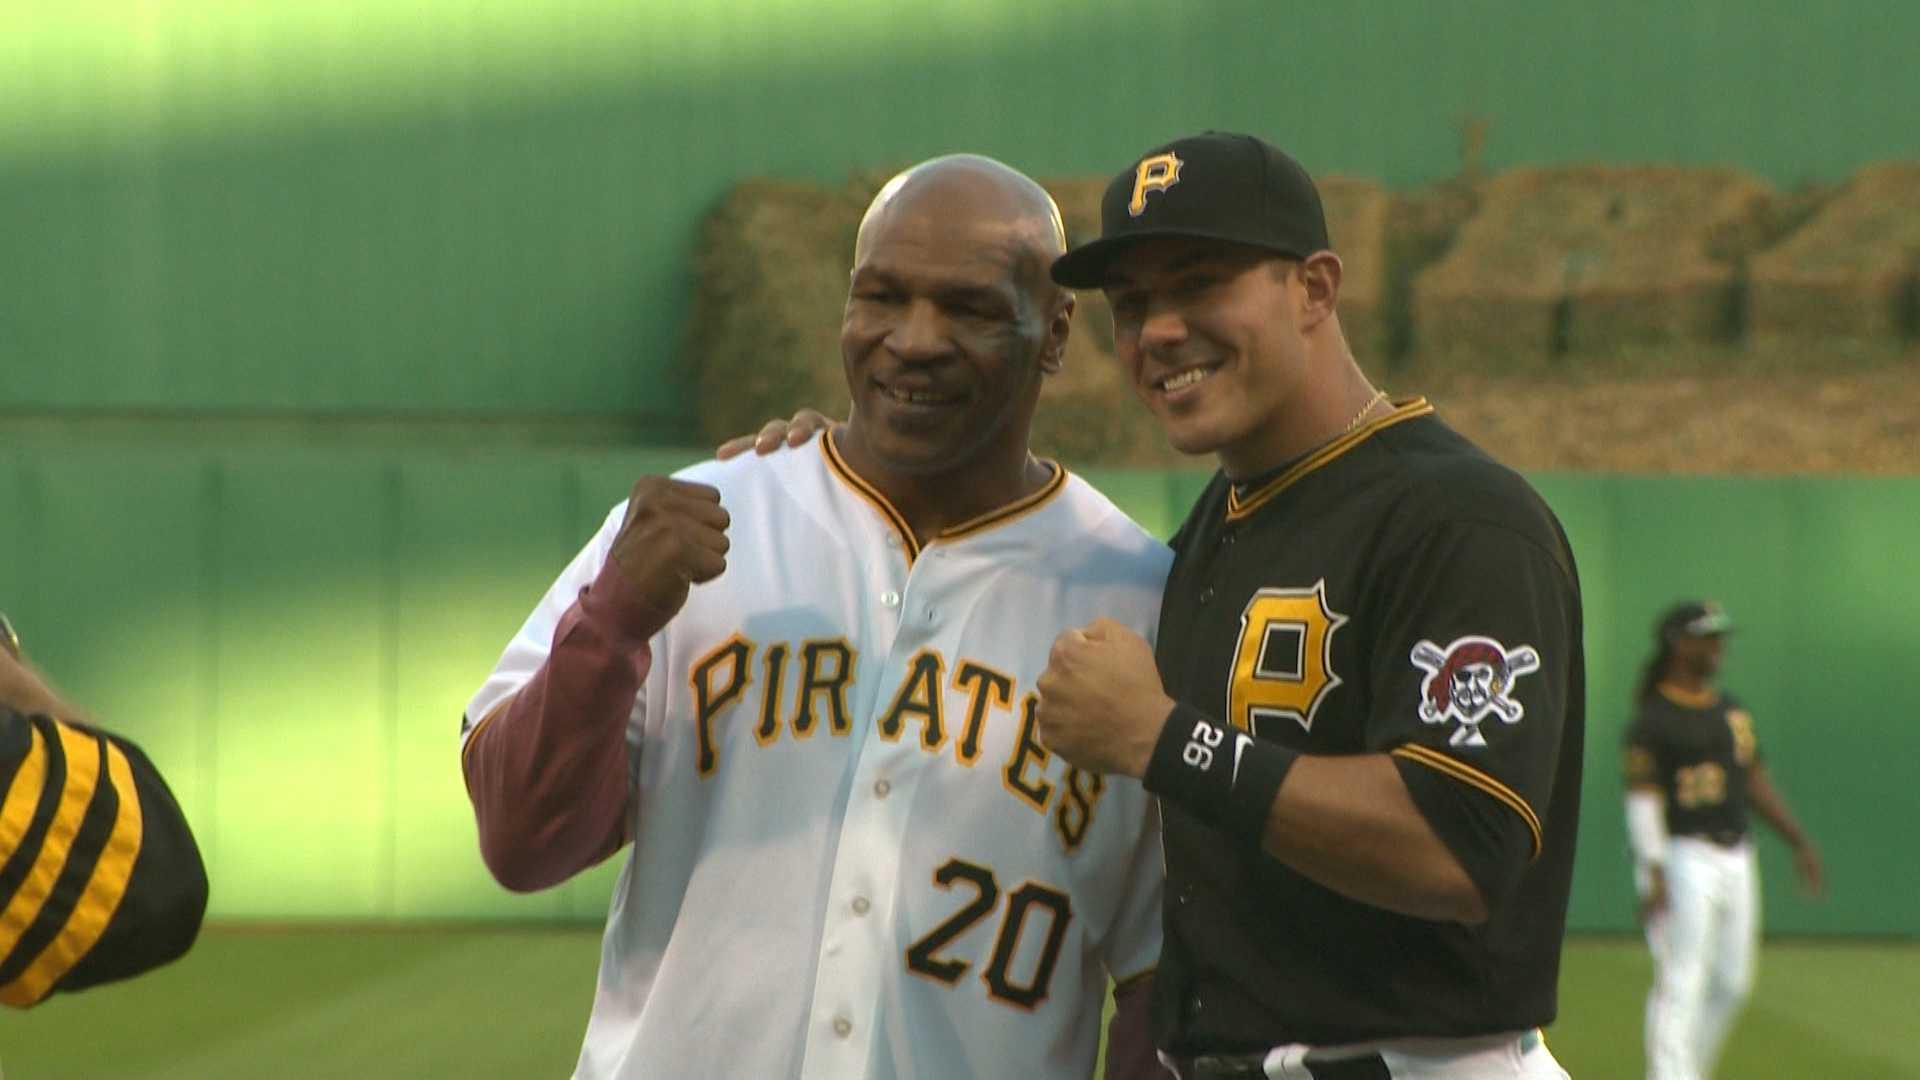 Mike Tyson and Pirates catcher Tony Sanchez